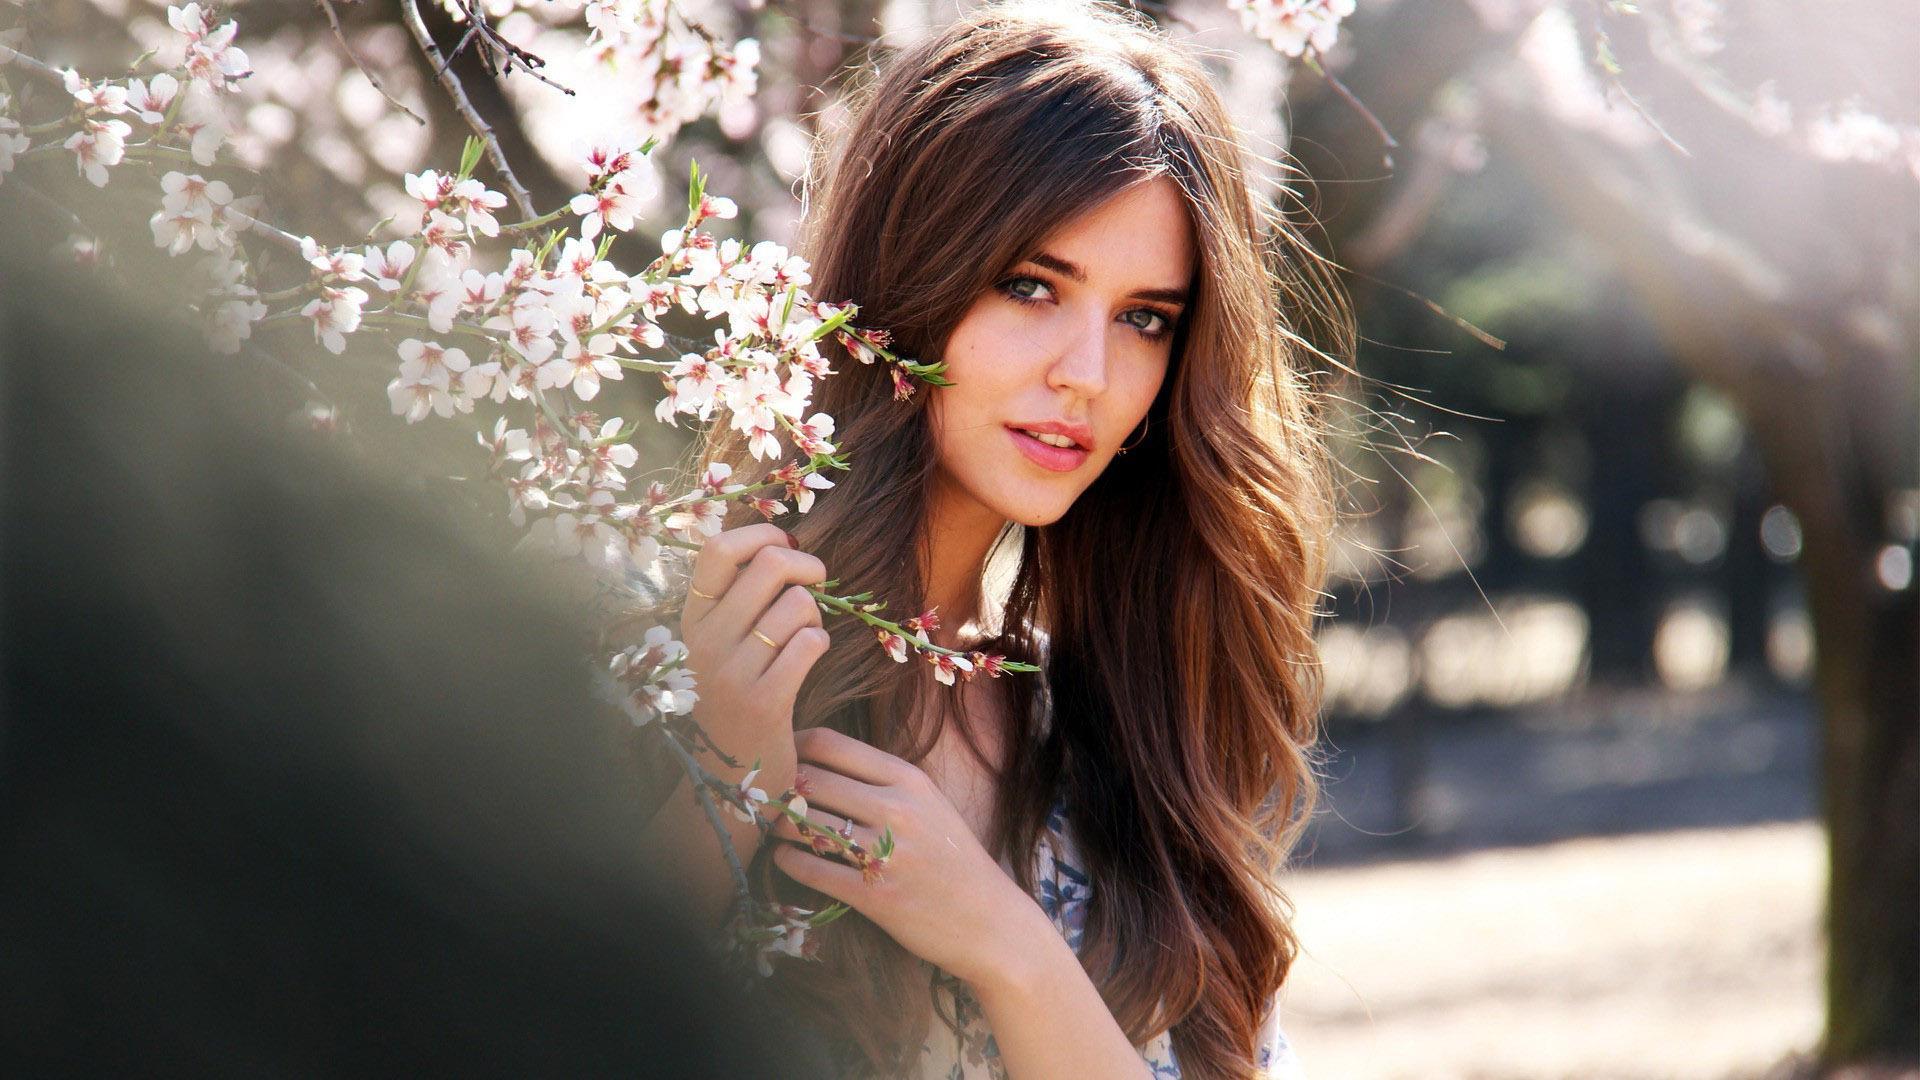 Clara-Alonso-Spanish-Model • iOS - 452.5KB